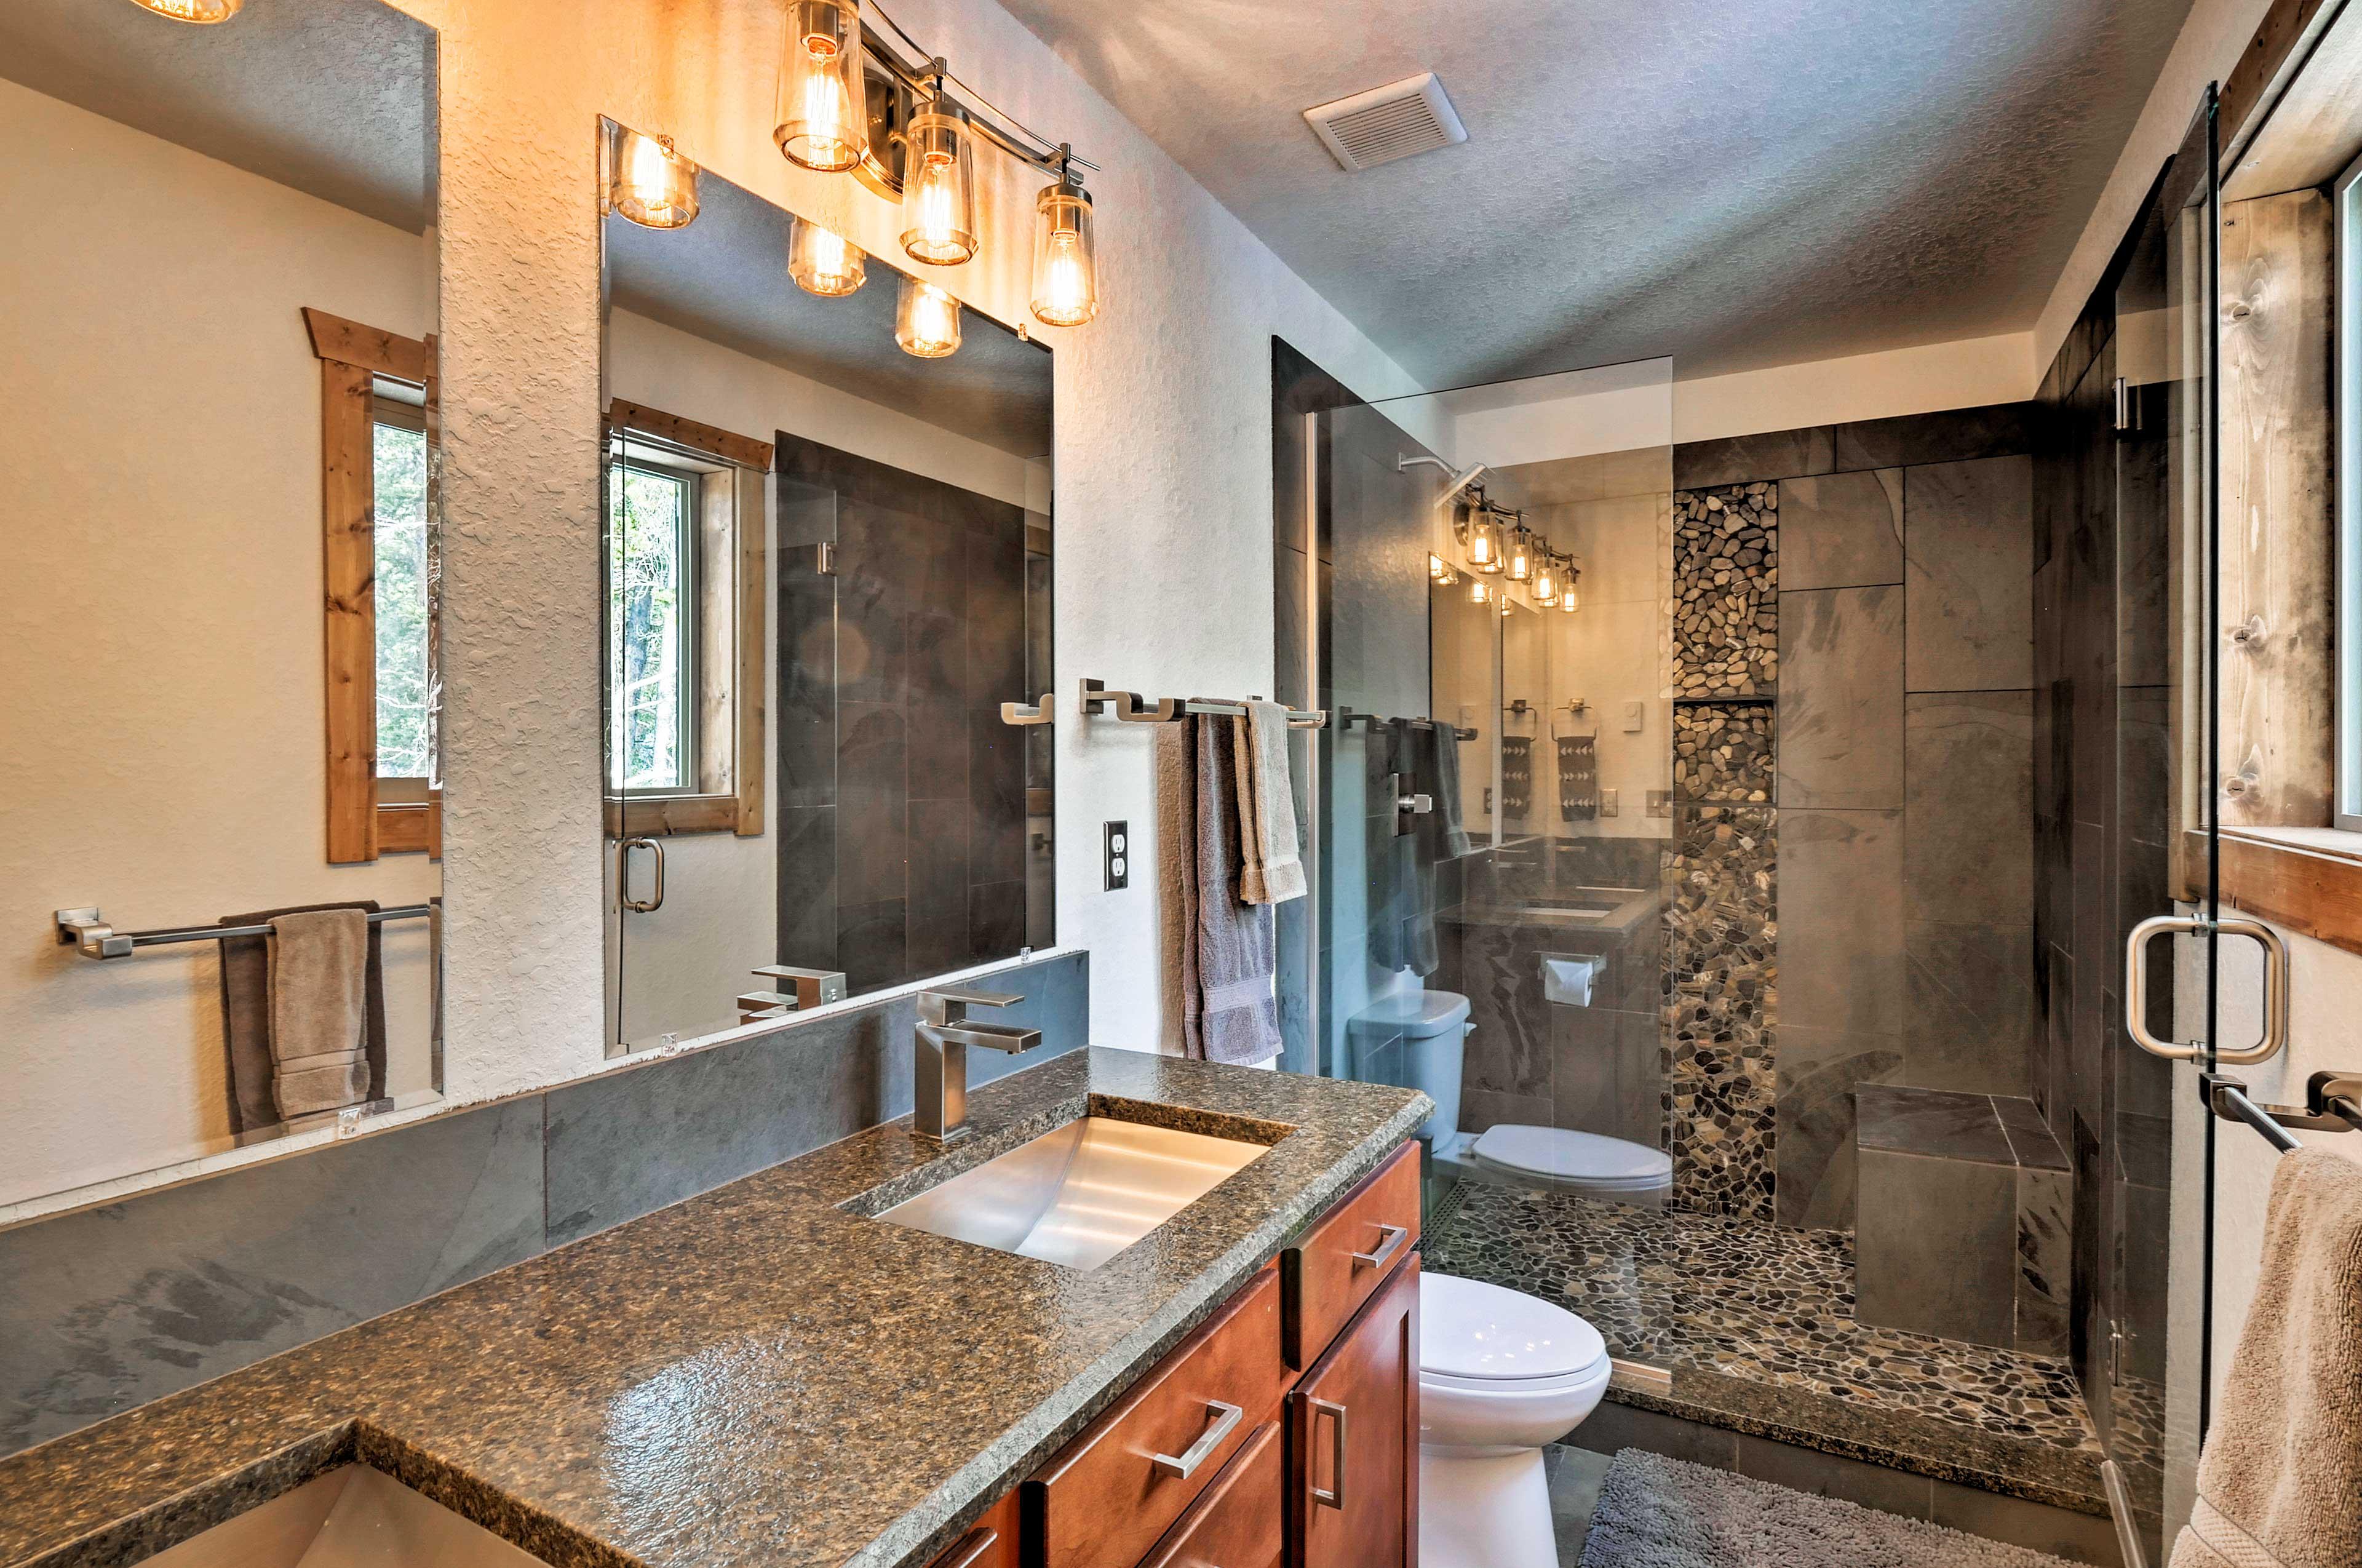 The en-suite bathroom has a large walk-in shower.